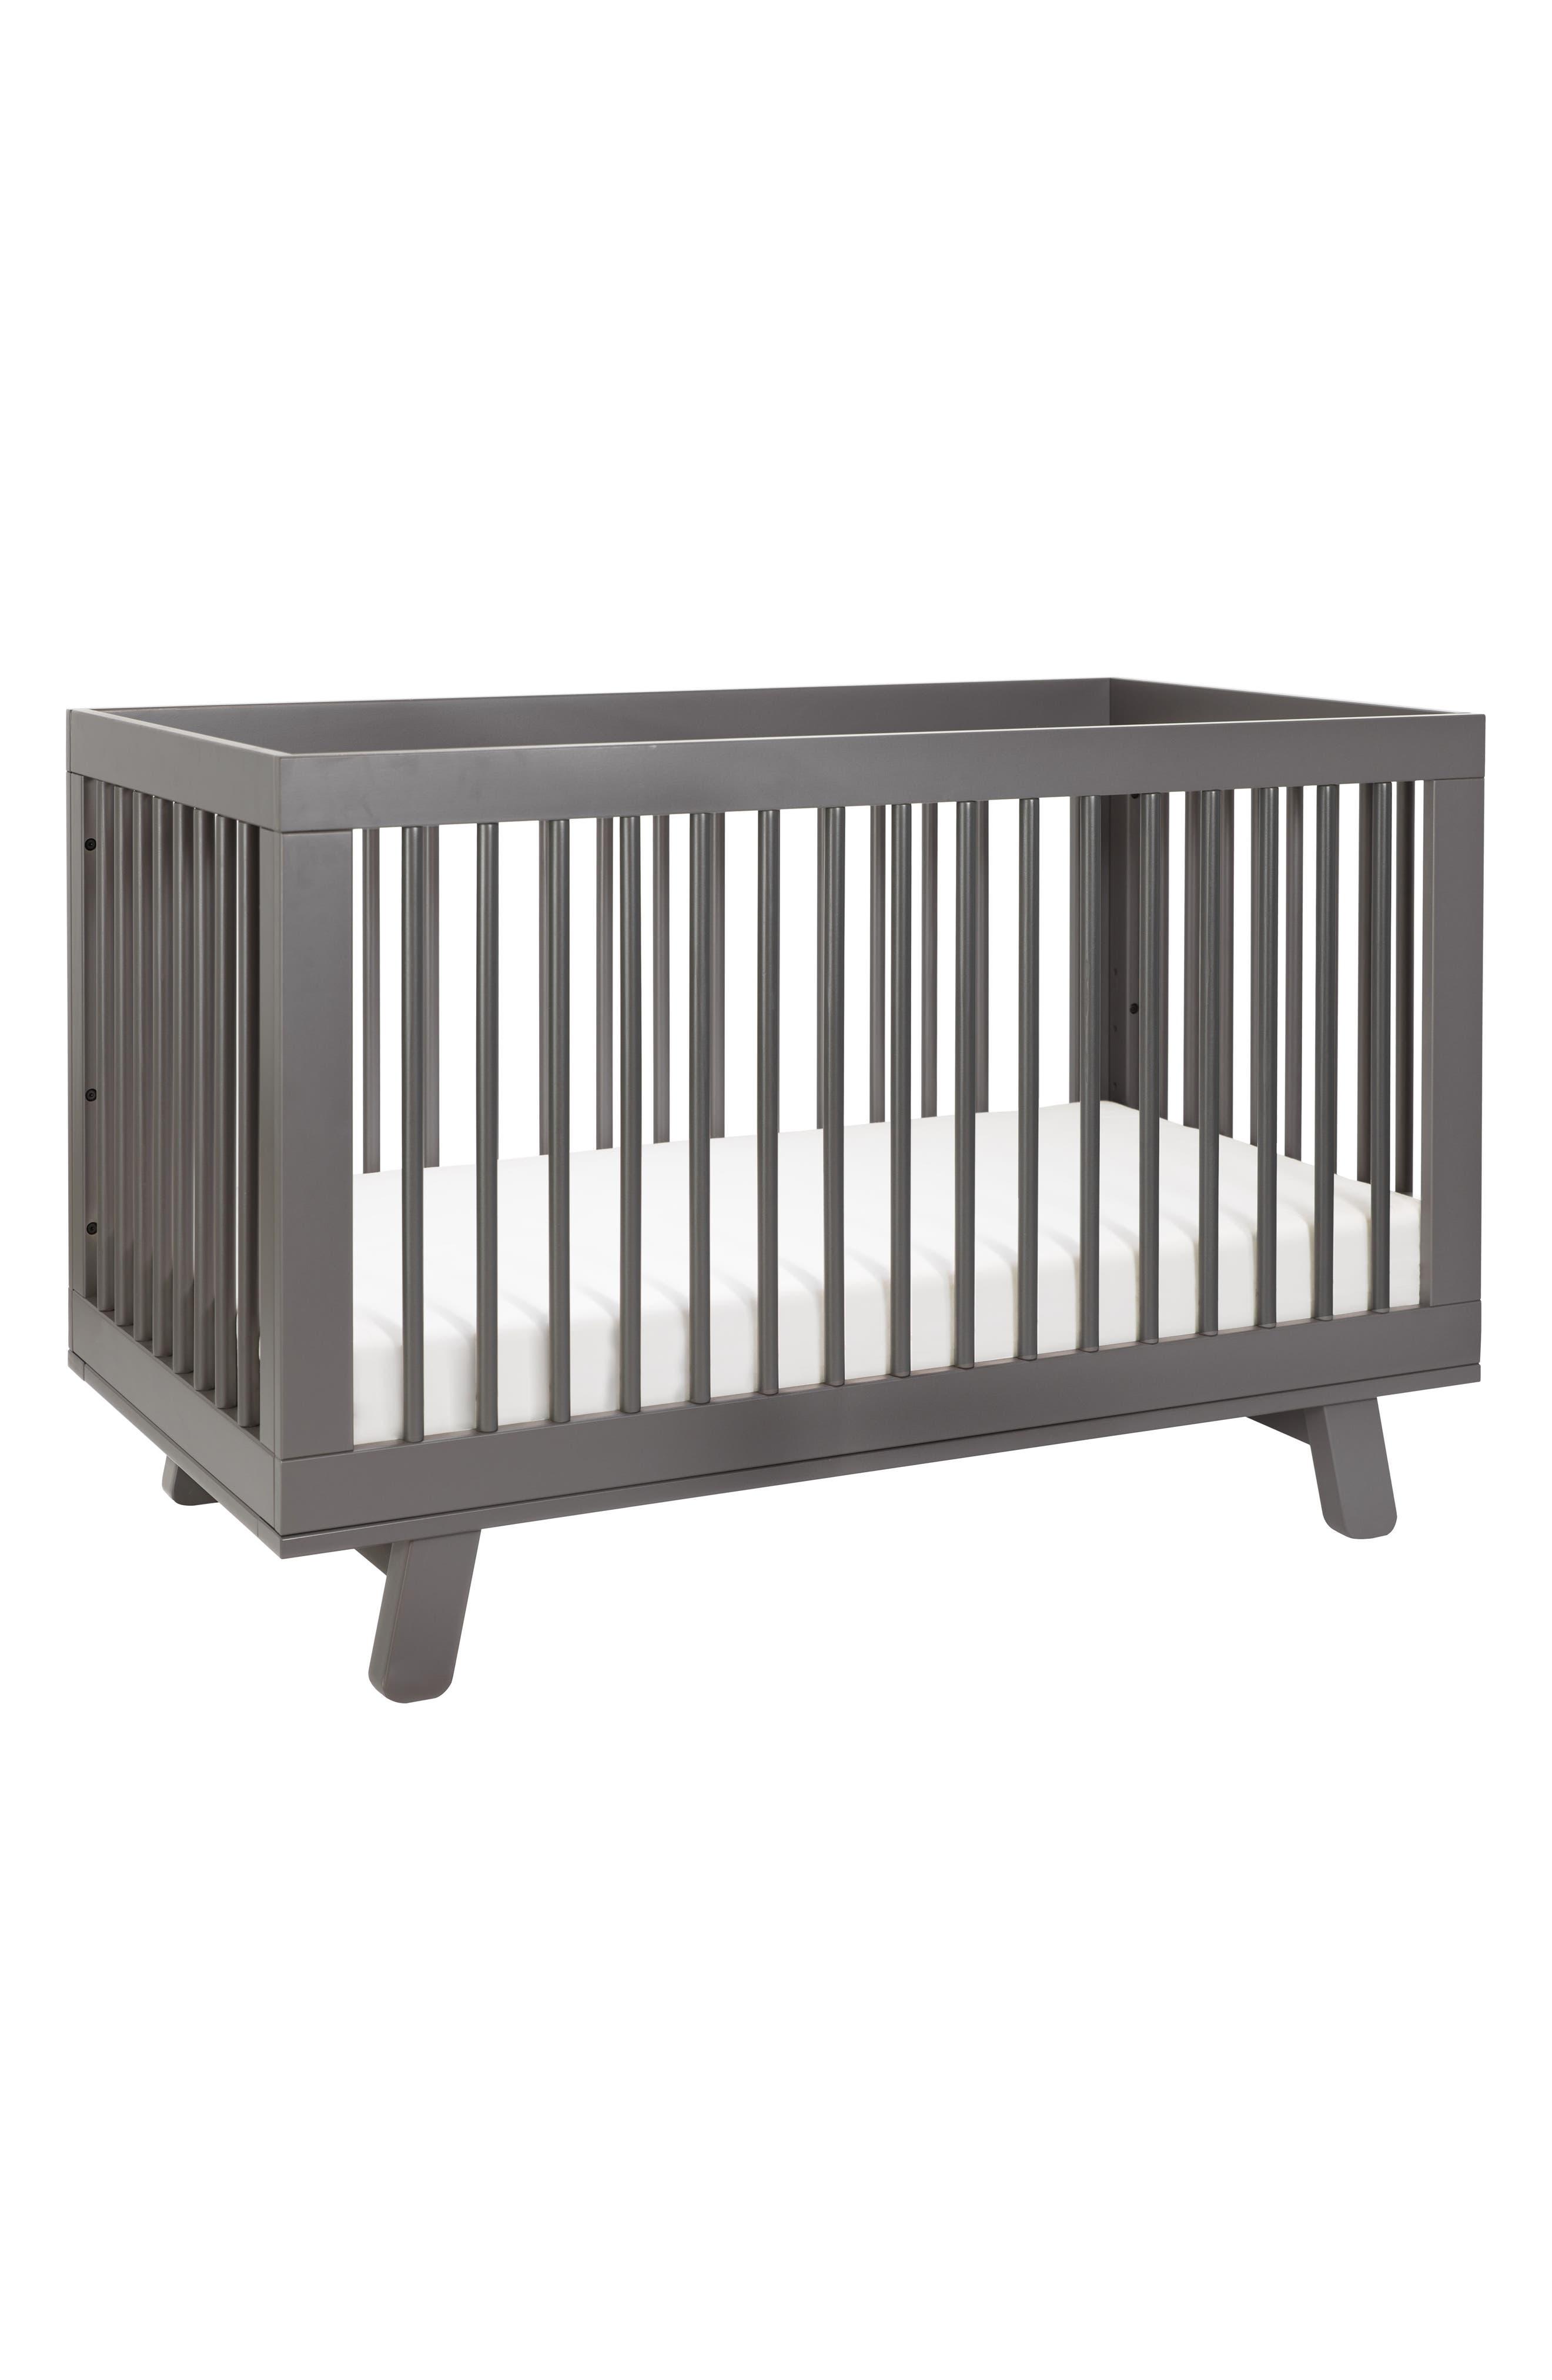 'Hudson' 3-in-1 Convertible Crib,                             Alternate thumbnail 2, color,                             021